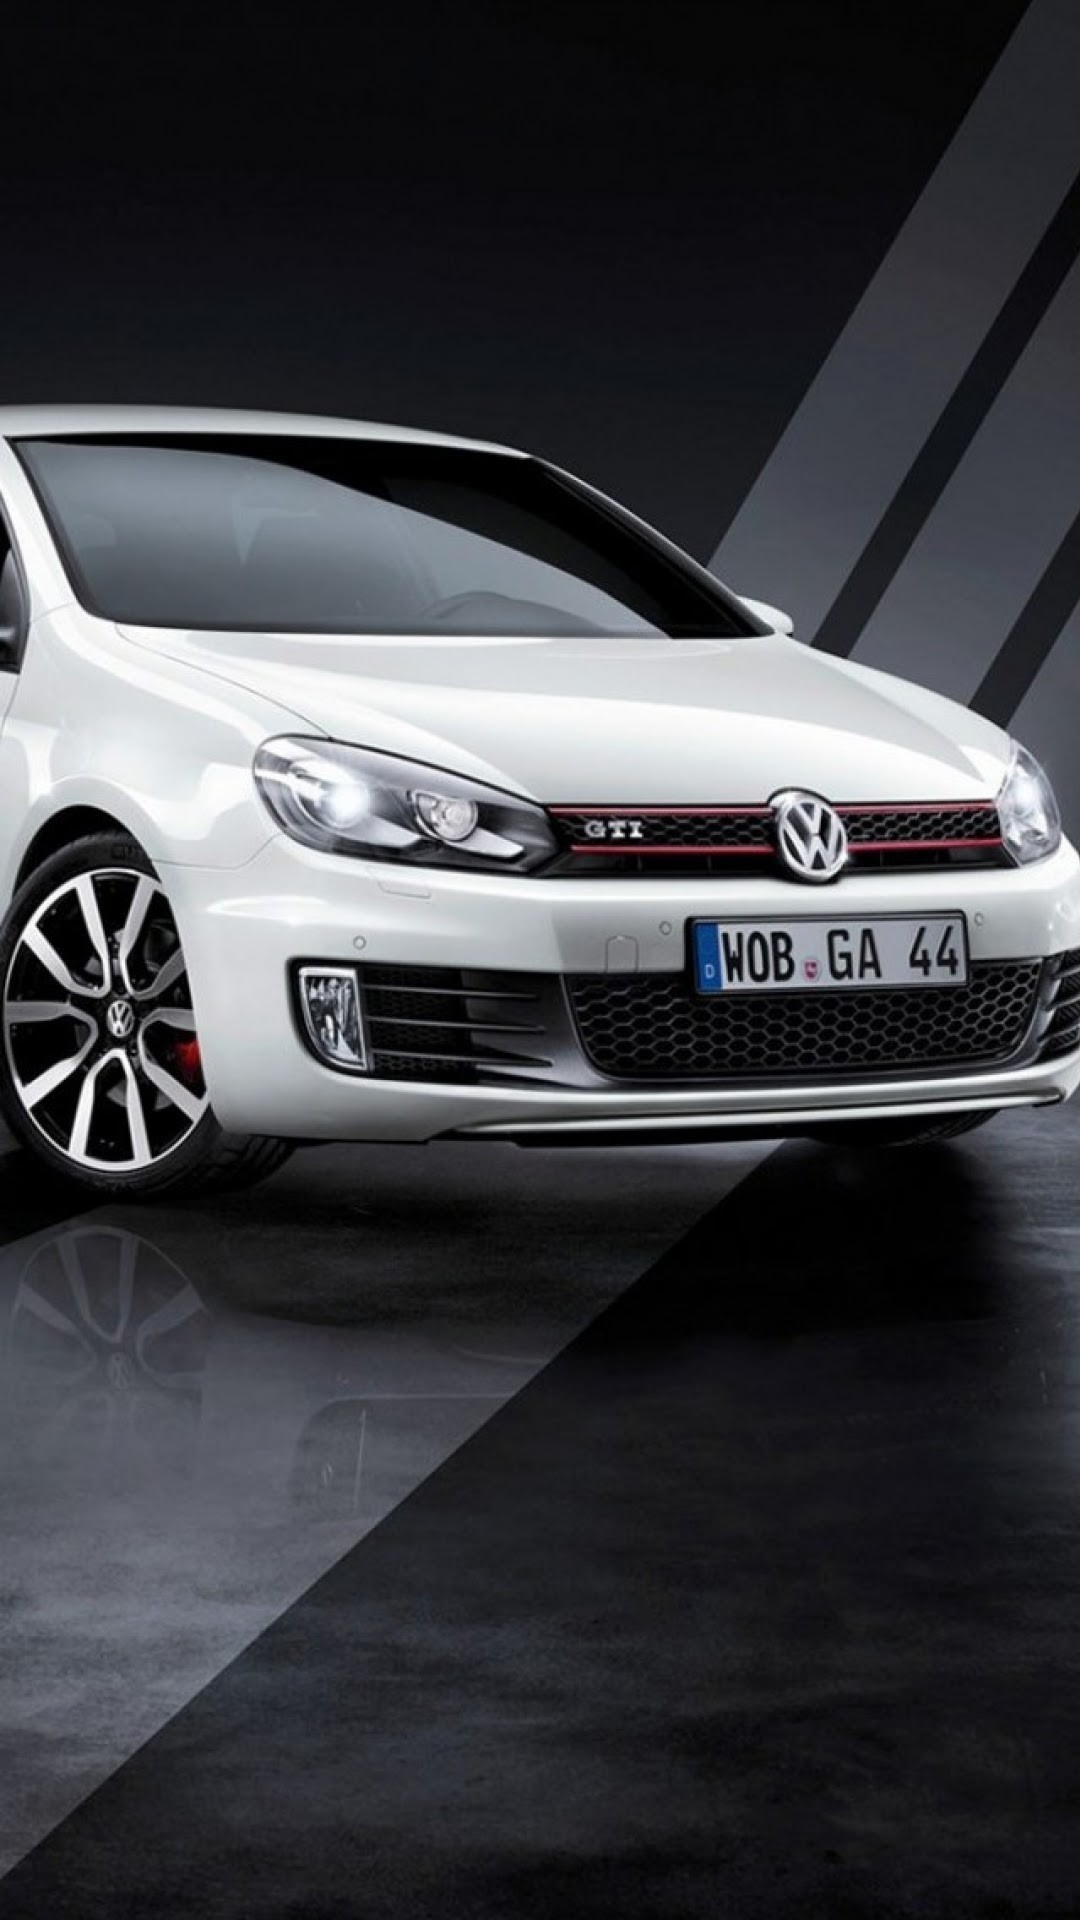 2000x1329 Volkswagen Golf GTI Clubsport S High Definition Wallpapers